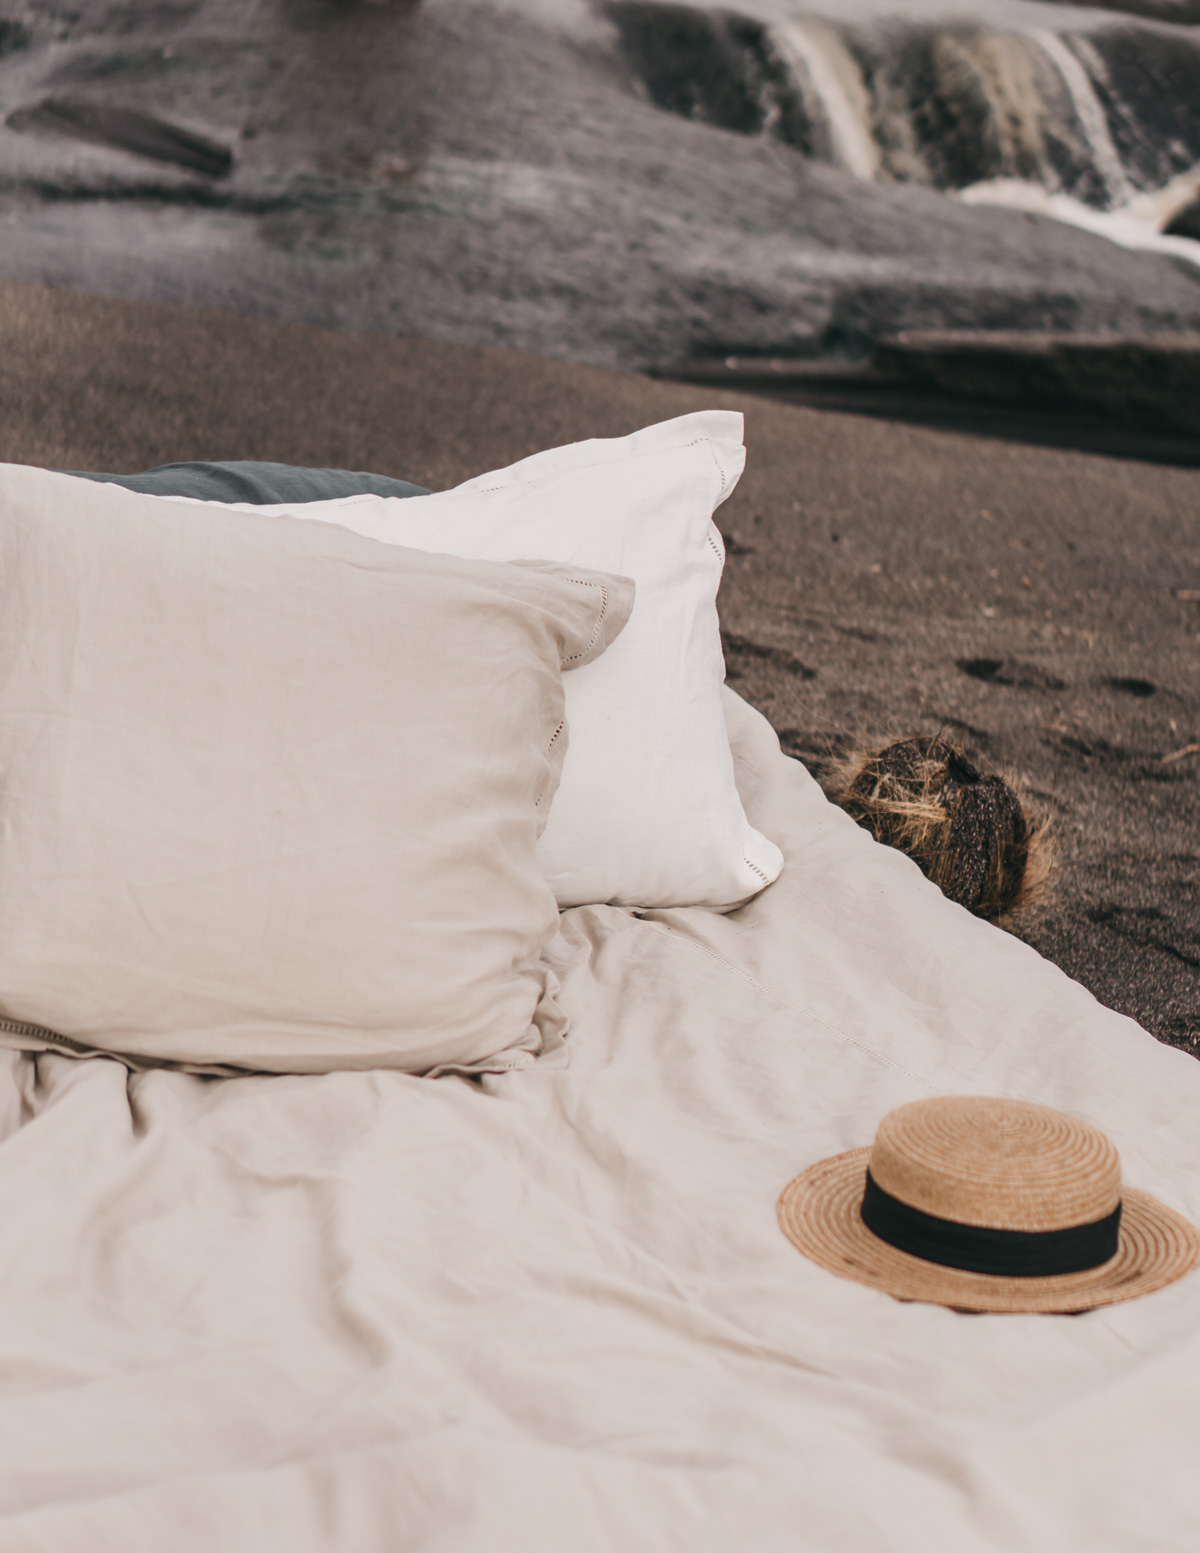 Keira-Mason-in-between-the-sheets-staraw-hat-at-beach.jpg